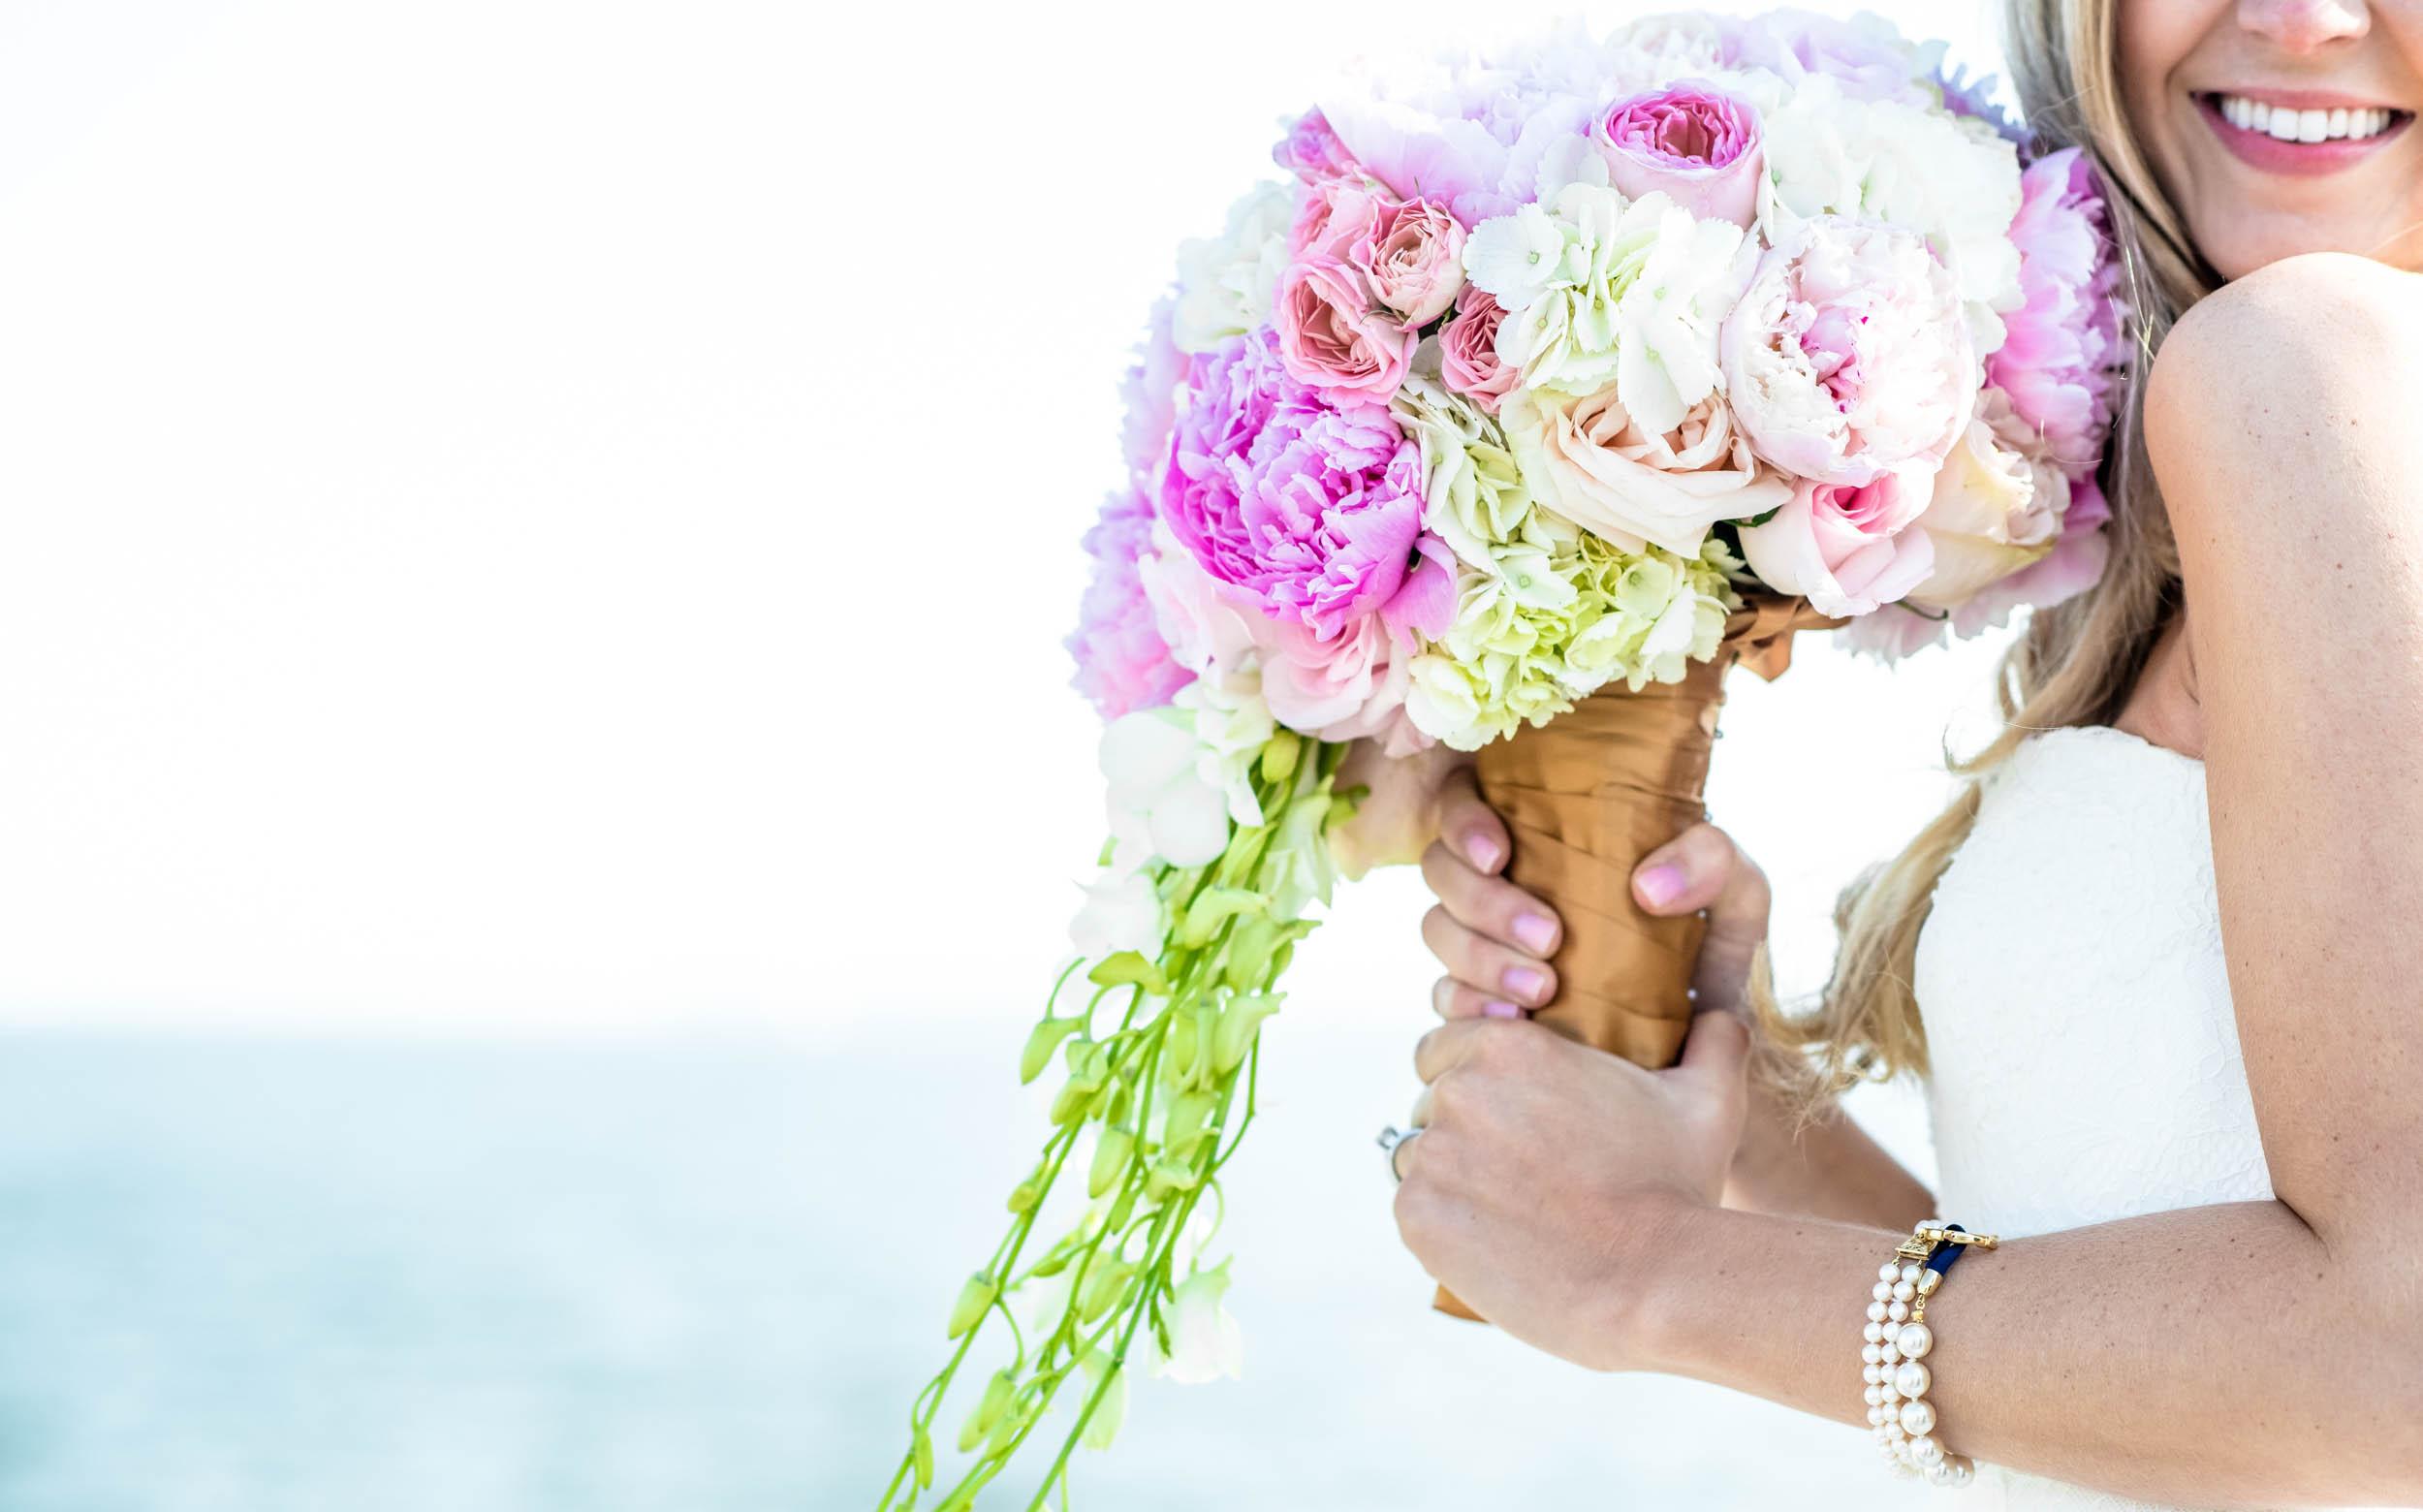 dc+metro+wedding+photographer+vadym+guliuk+photography+wedding+flowers-2020.jpg